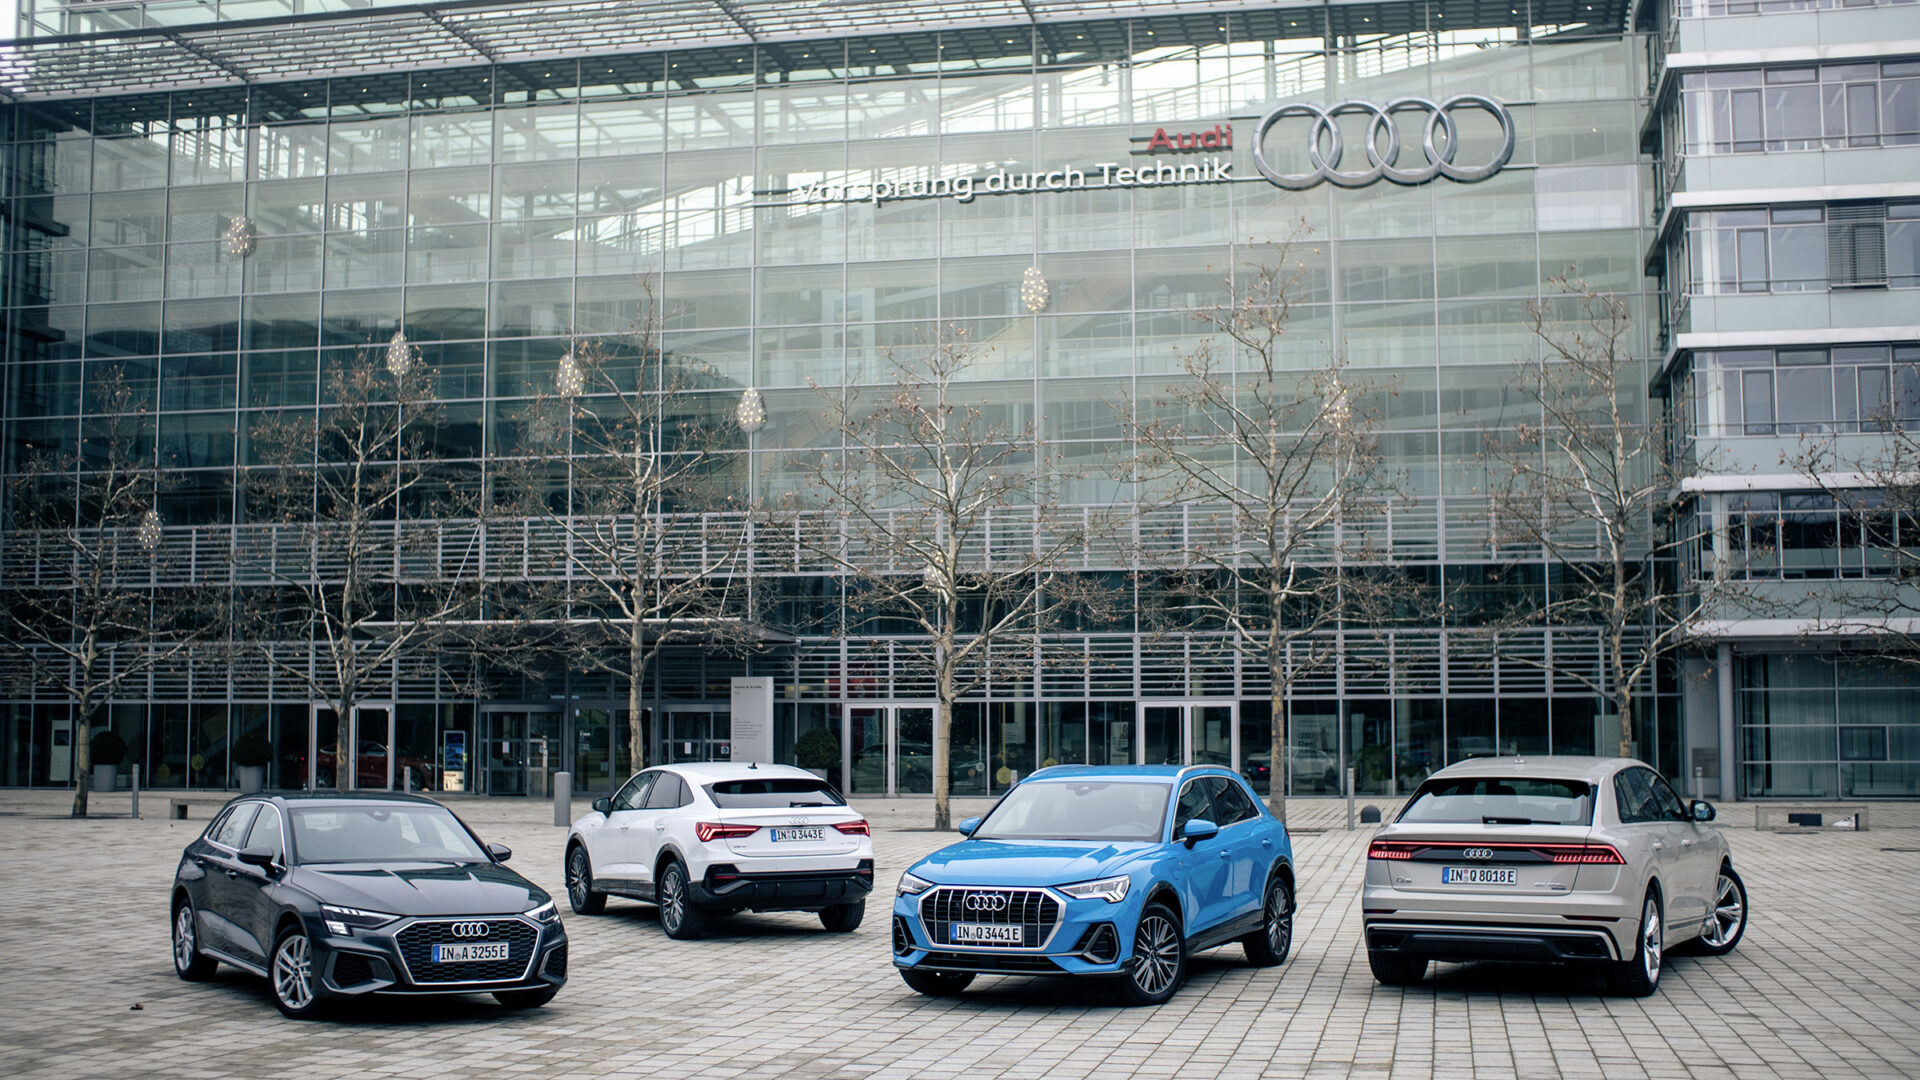 Audi A3 Sportback 40 TFSI e, Colour: Daytona grey Audi Q3 Sportback 45 TFSI e, Colour: Glacier white Audi Q3 45 TFSI e, Colour: Turbo blue Audi Q8 60 TFSI e quattro, Colour: Vicuρa beige